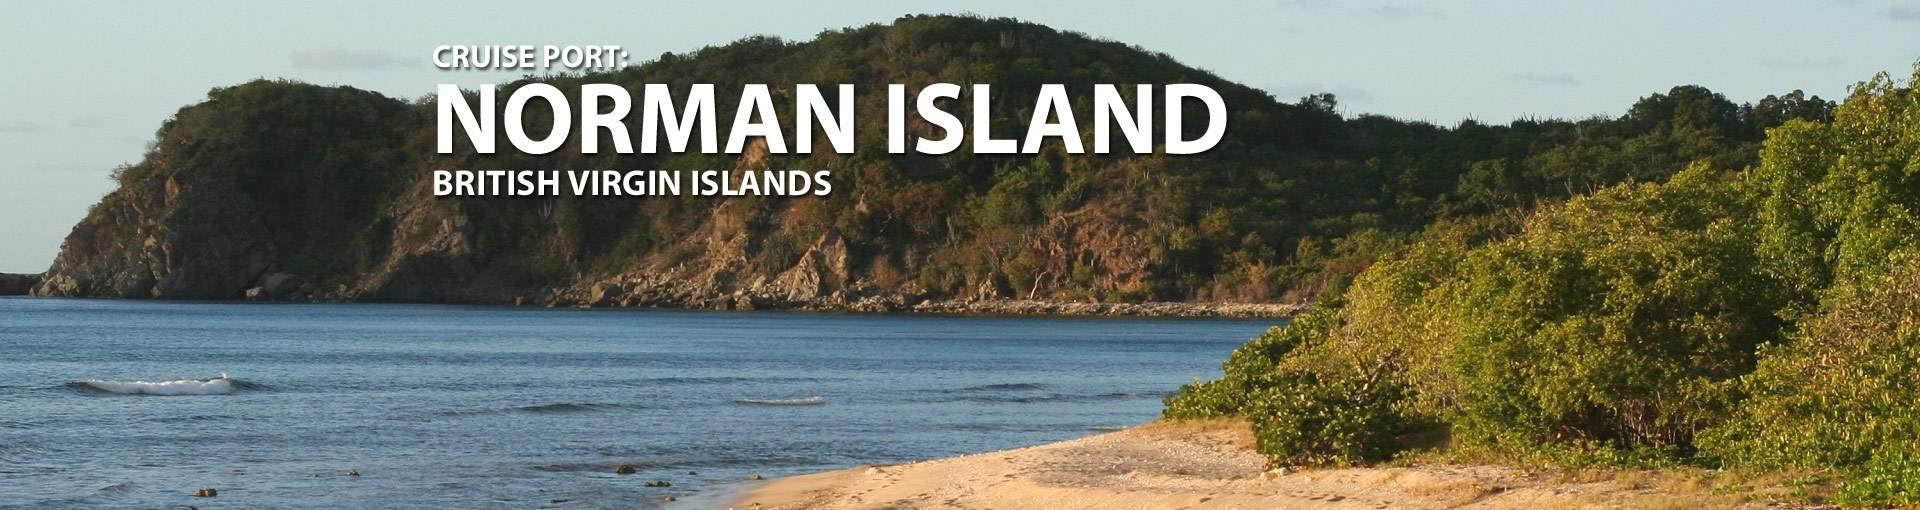 Norman Island, BVI Cruise Port